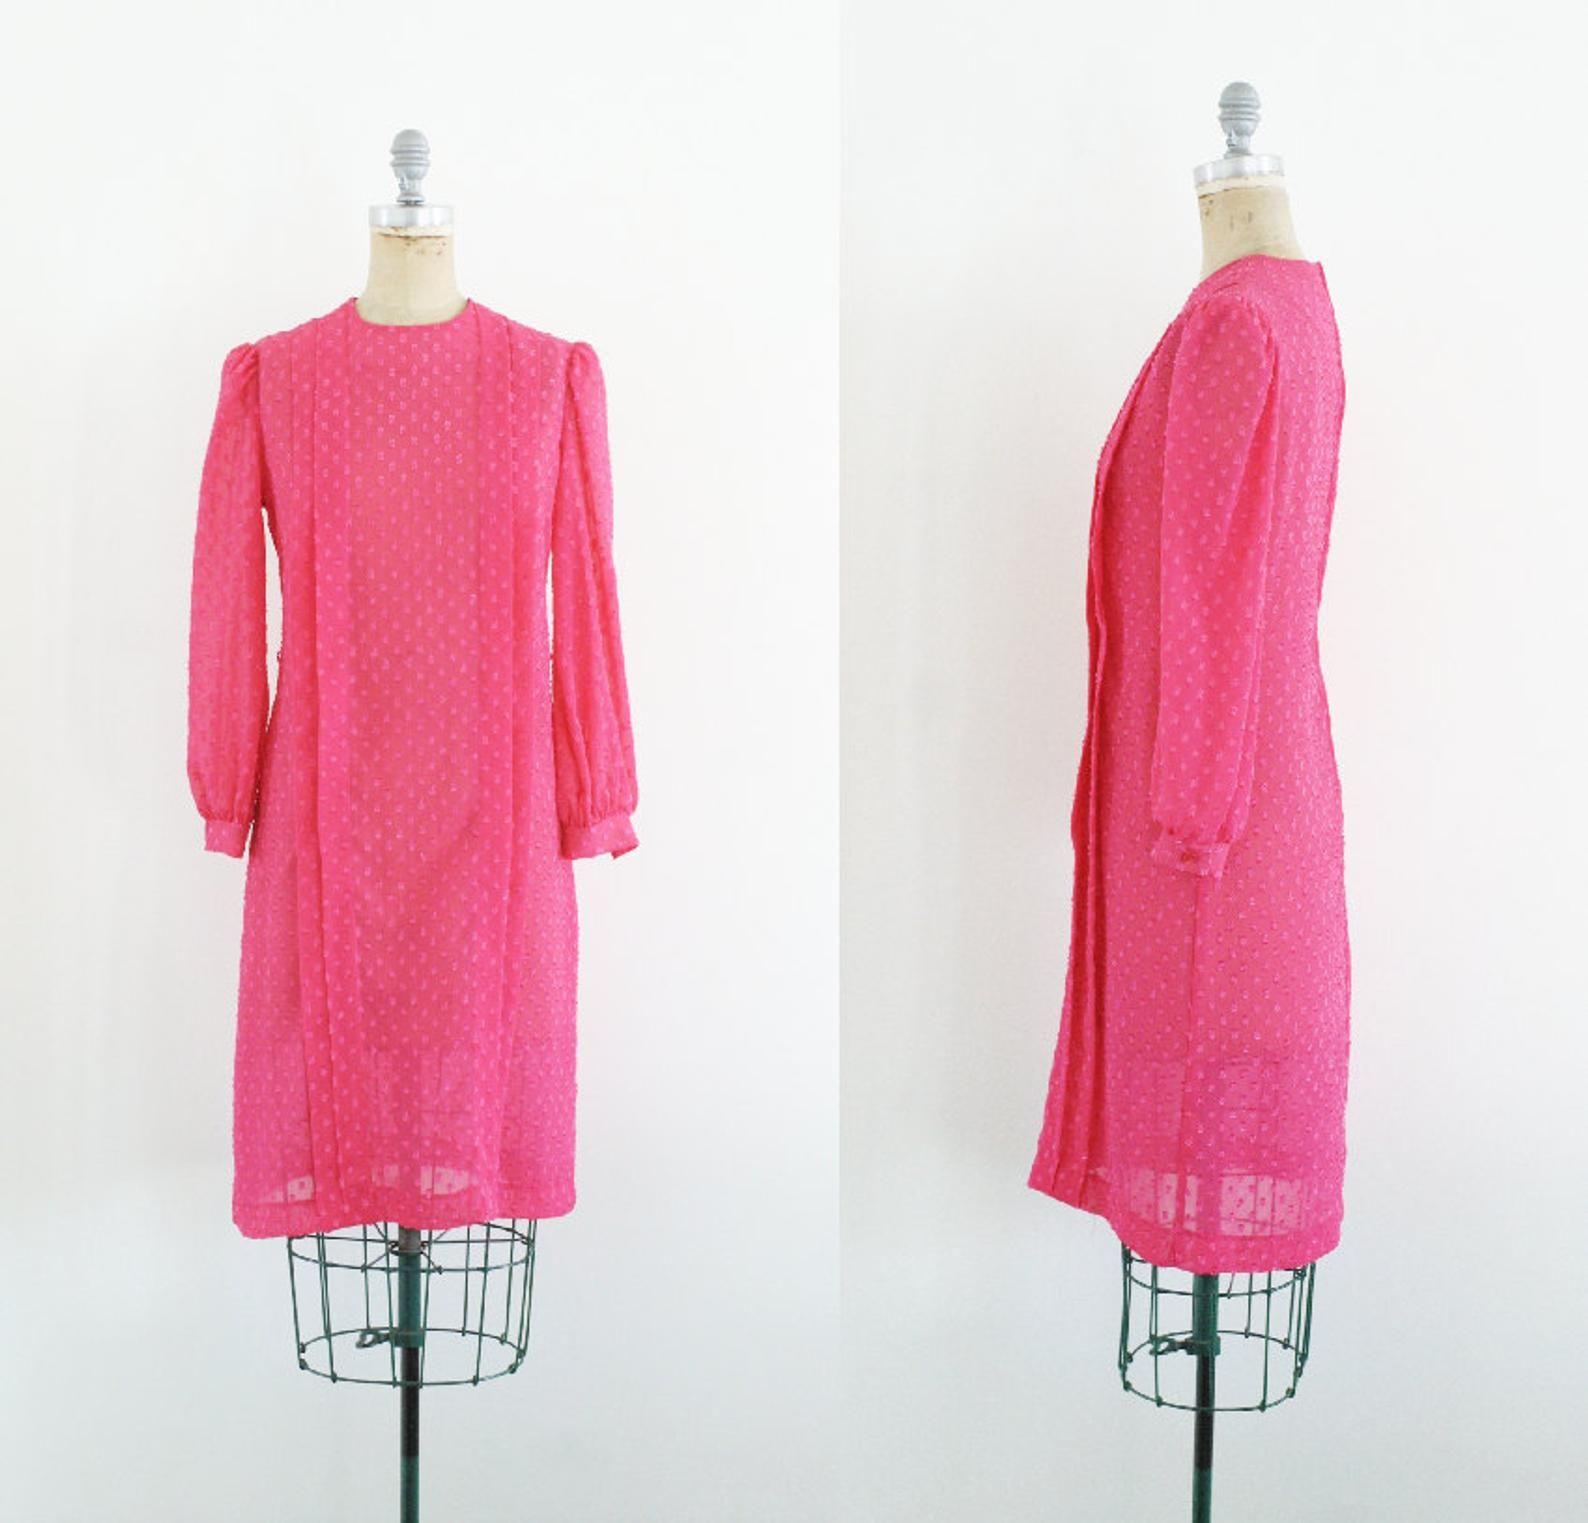 Vintage 1970s Hot Pink Polka Dot Dress Swiss Dots Dress 70s Shift Dress Pink Shift Dress Pink Swiss Dots Dress Sheer Size 8 S